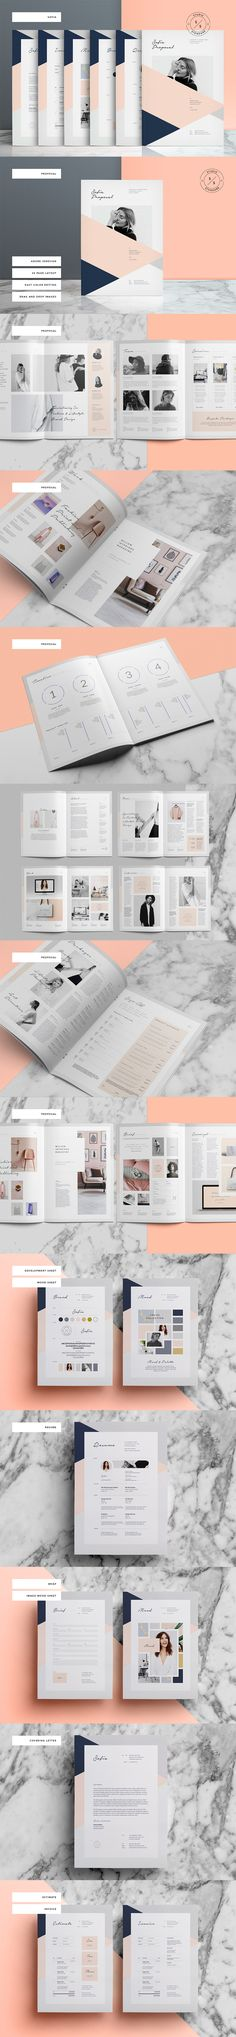 The Professional Designer's Time-Saving Toolkit